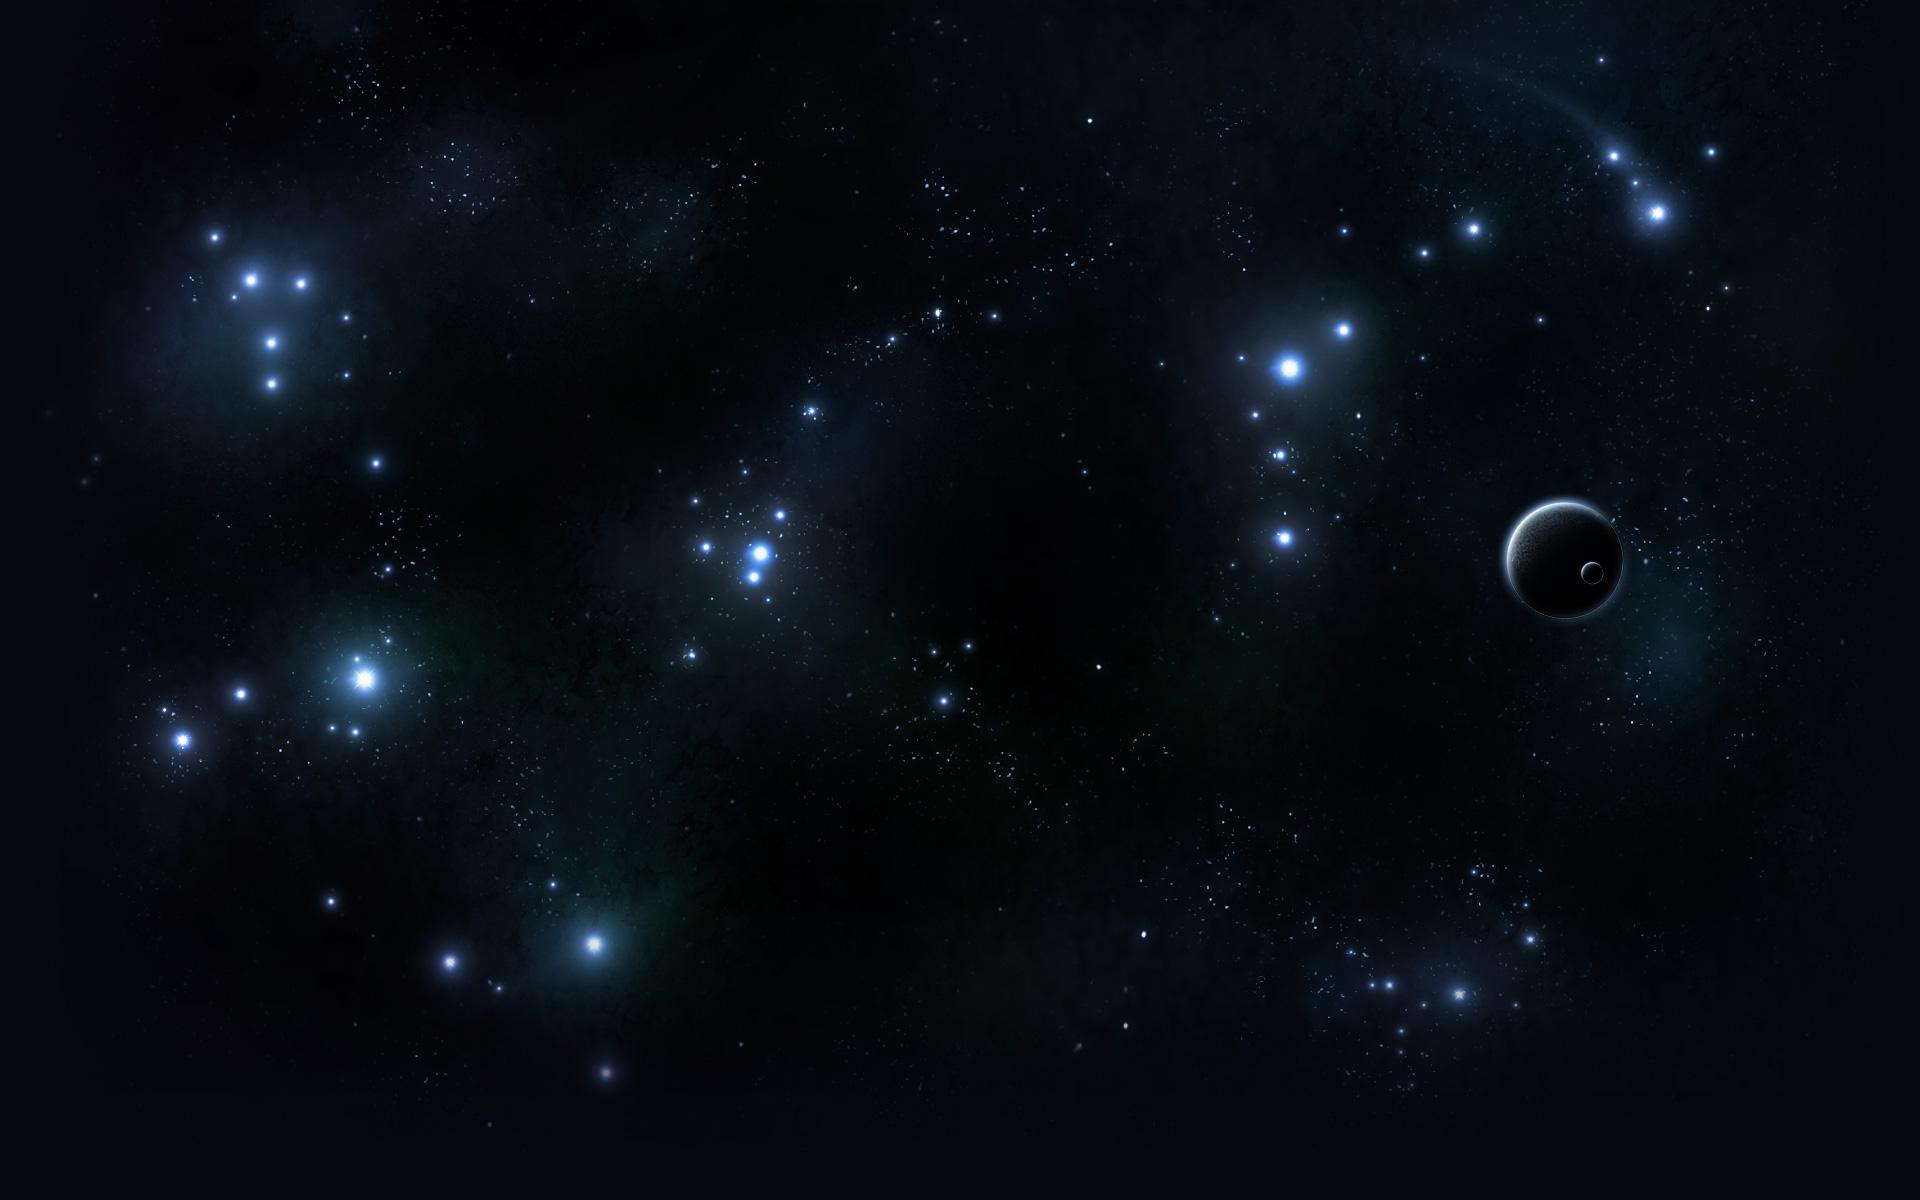 Background Image Changer - DreamCodes